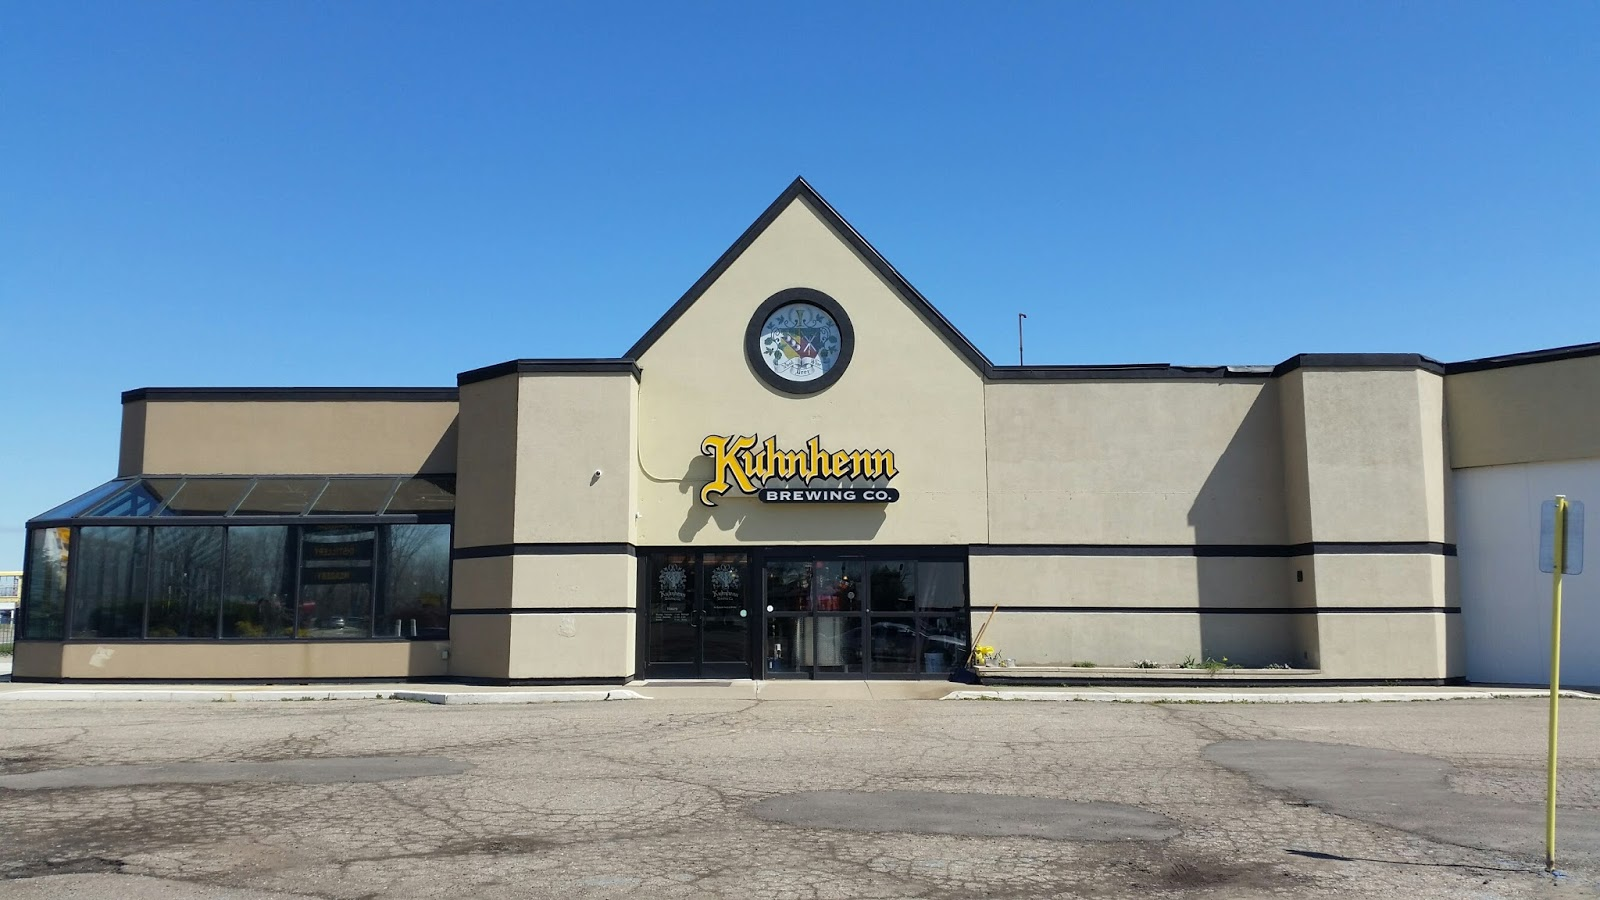 Kuhnhenn Brewing Co.